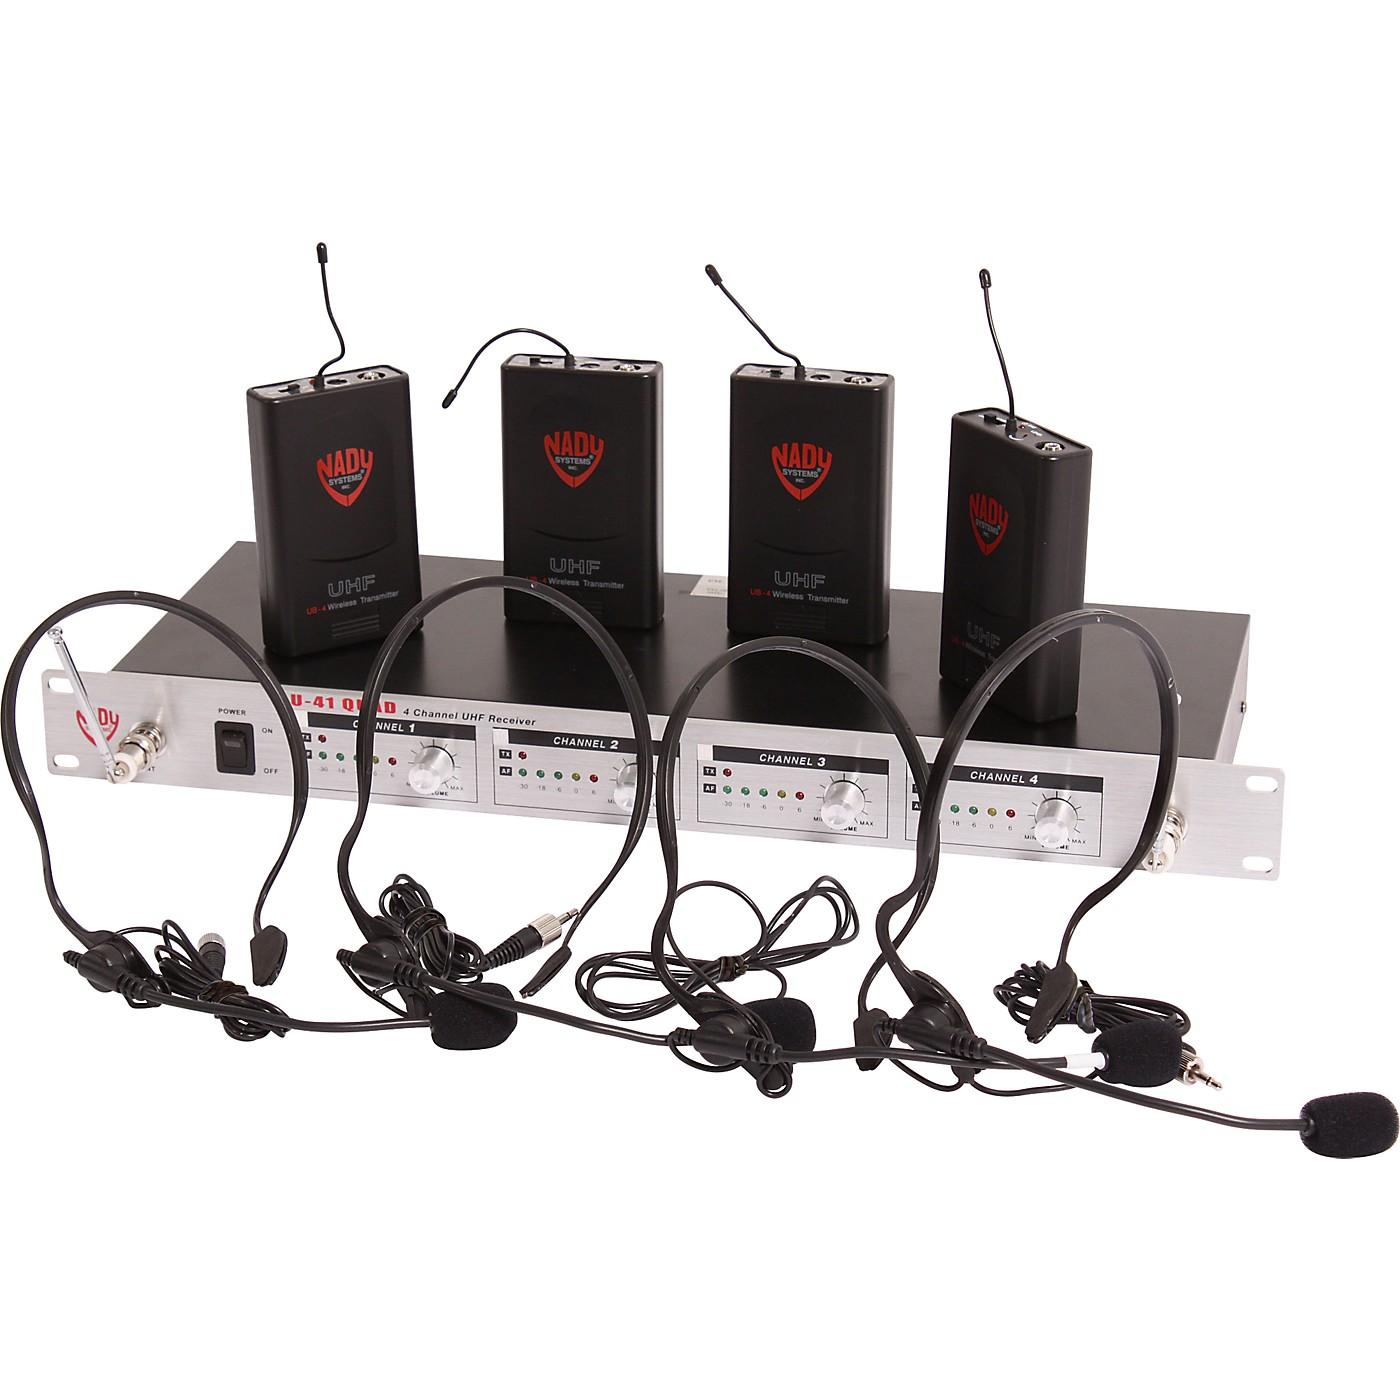 Nady U-41 Quad HM3 Headset Wireless System (14/16/10/12) thumbnail